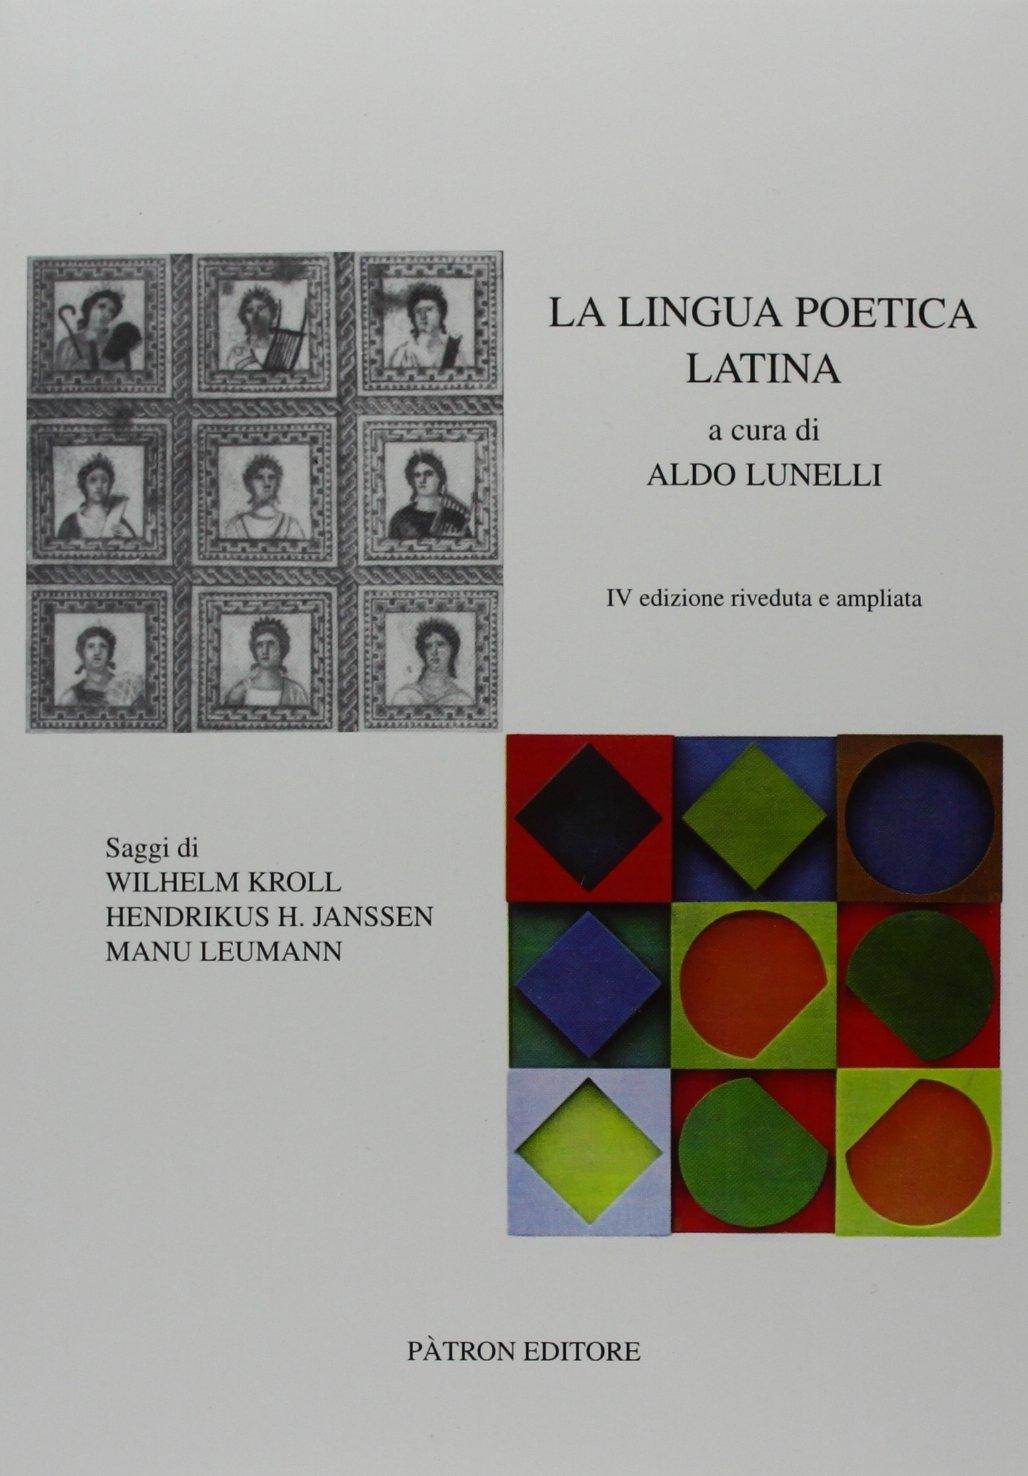 La lingua poetica latina